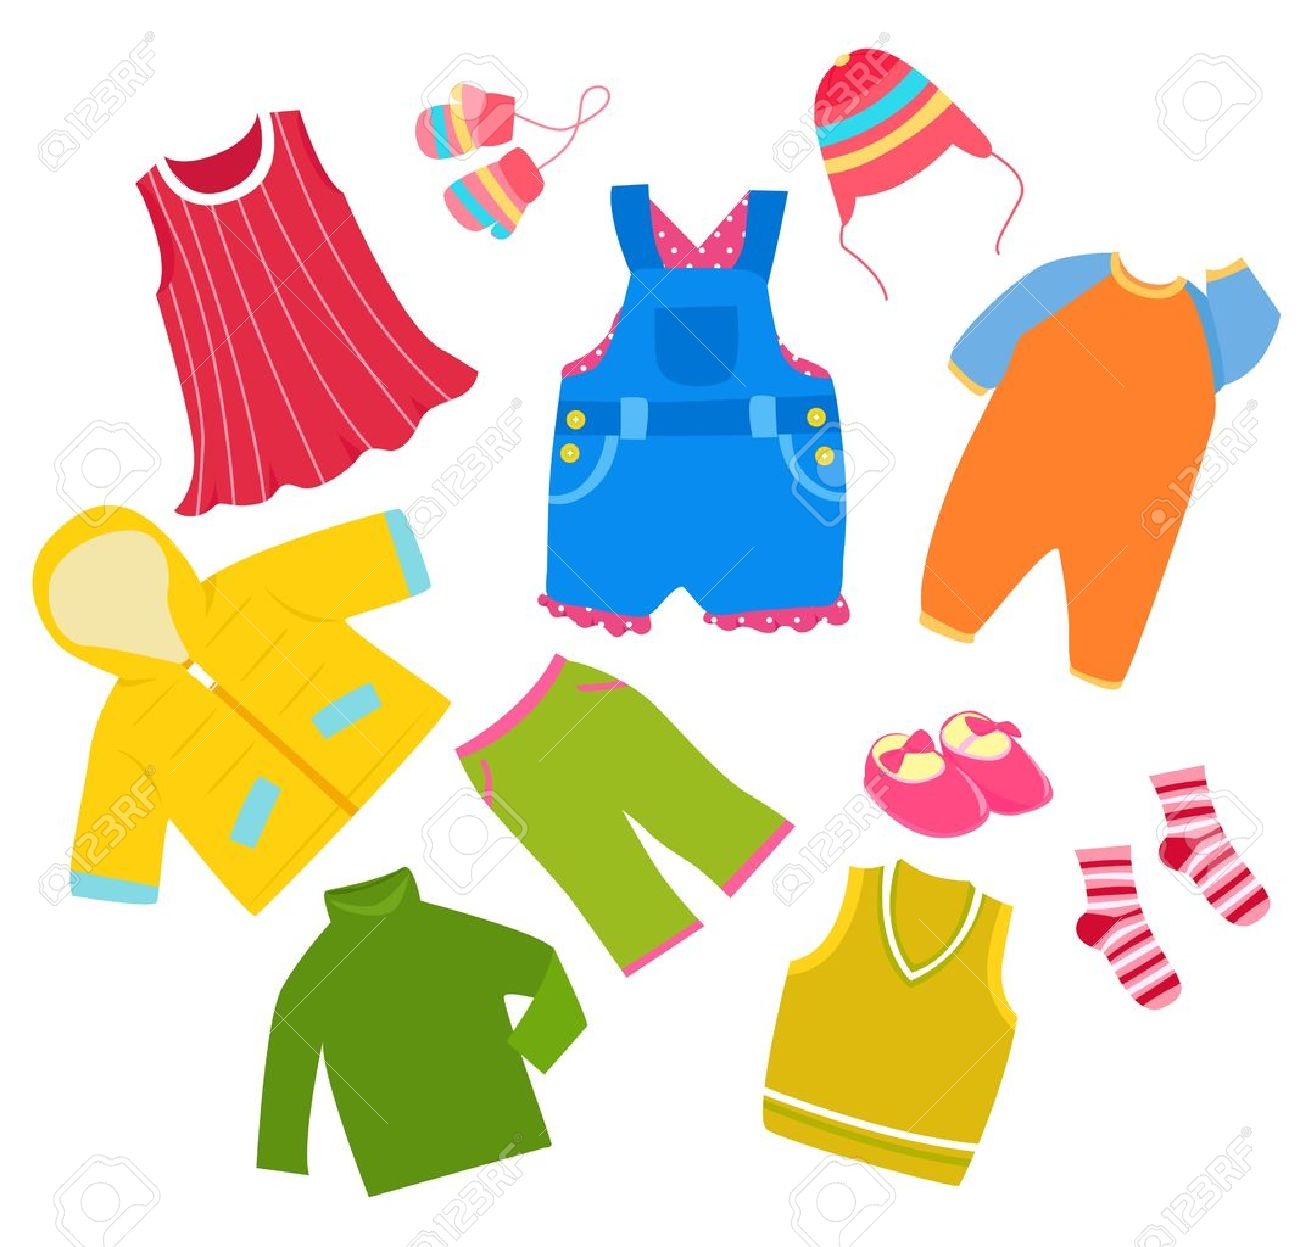 Kids clothes clipart 7 » Clipart Station.